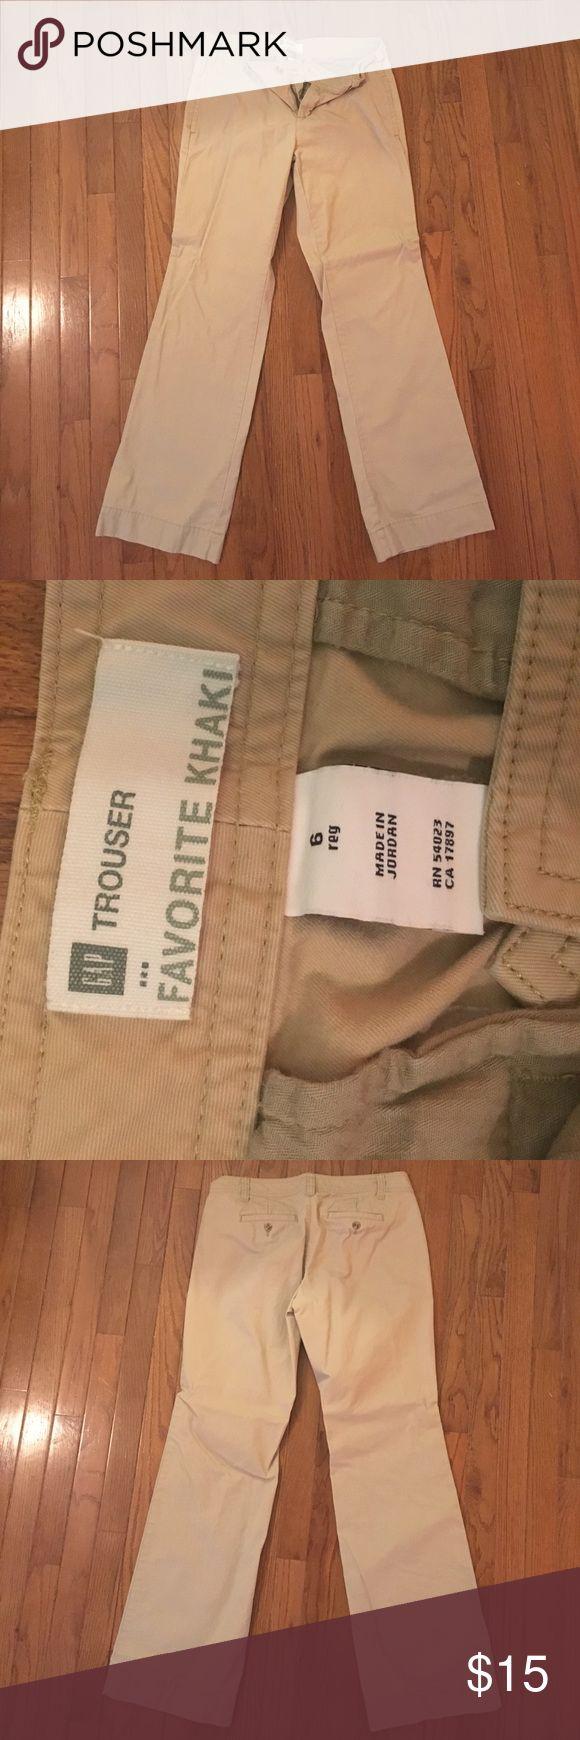 Gap Khaki trouser pants Khaki straight leg gap trouser dress pants GAP Pants Trousers